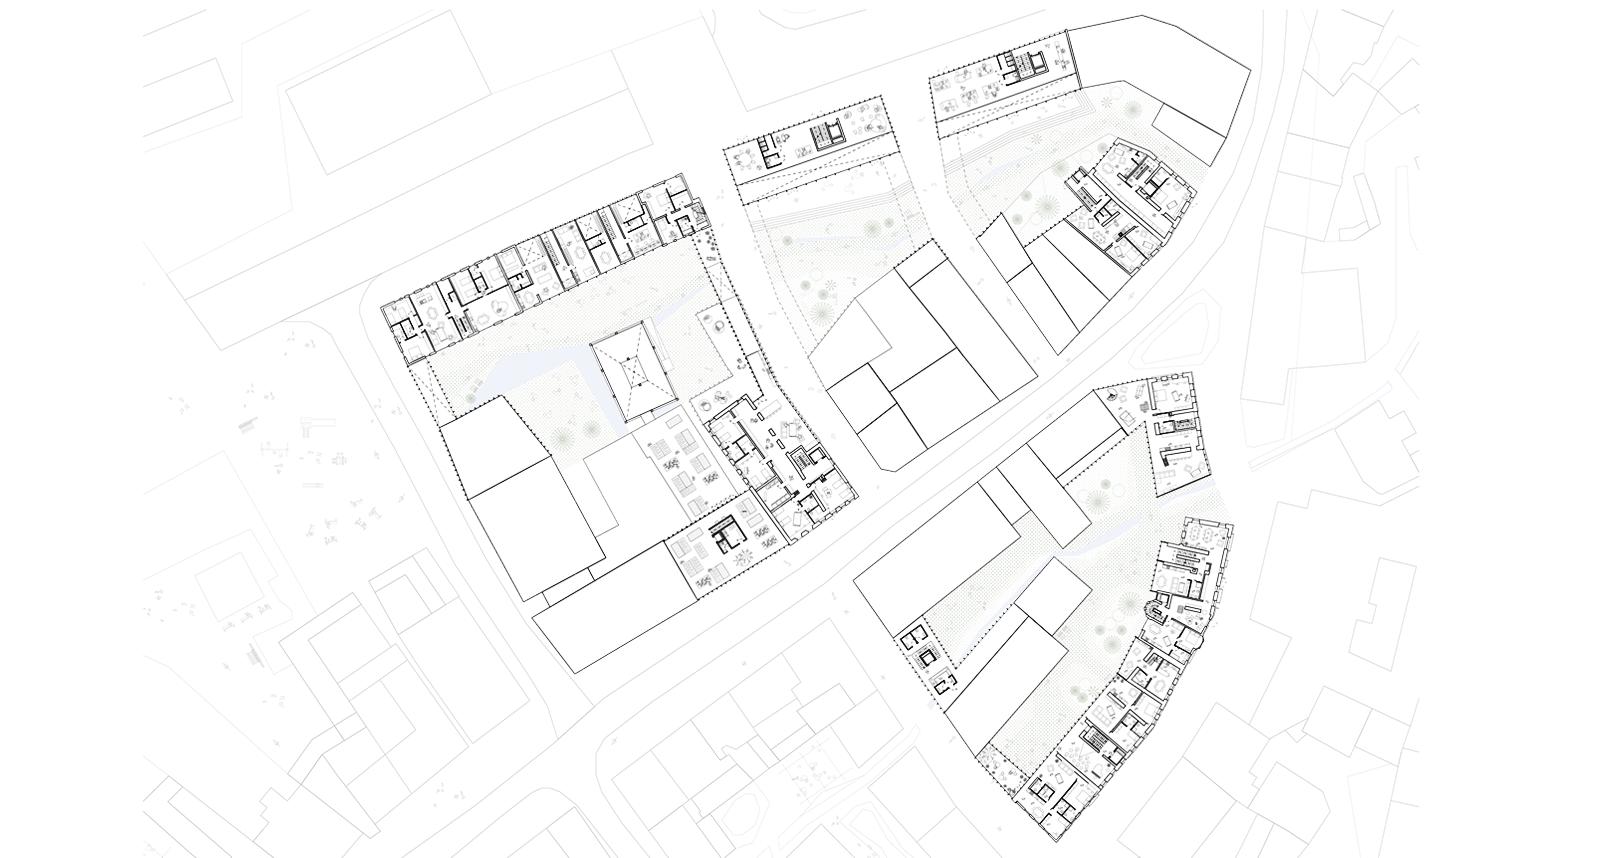 europan-13-selb-first-floor